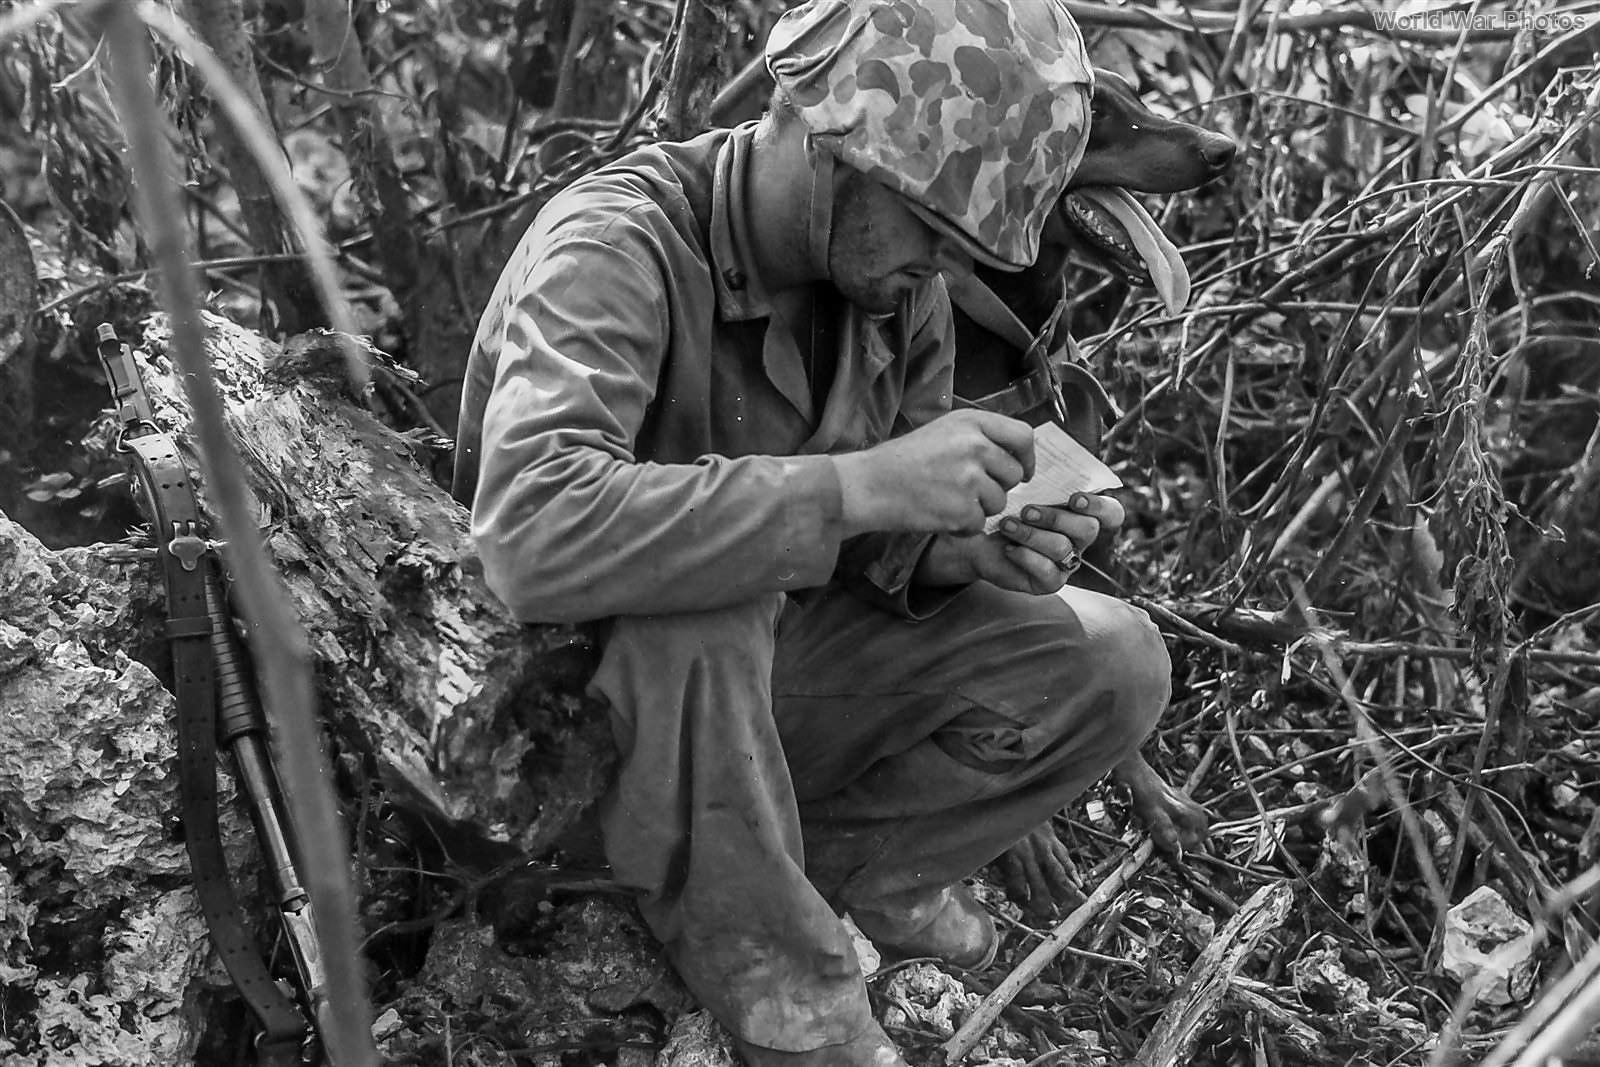 Marine_Dog_Handler_with_Model_1897_Winch